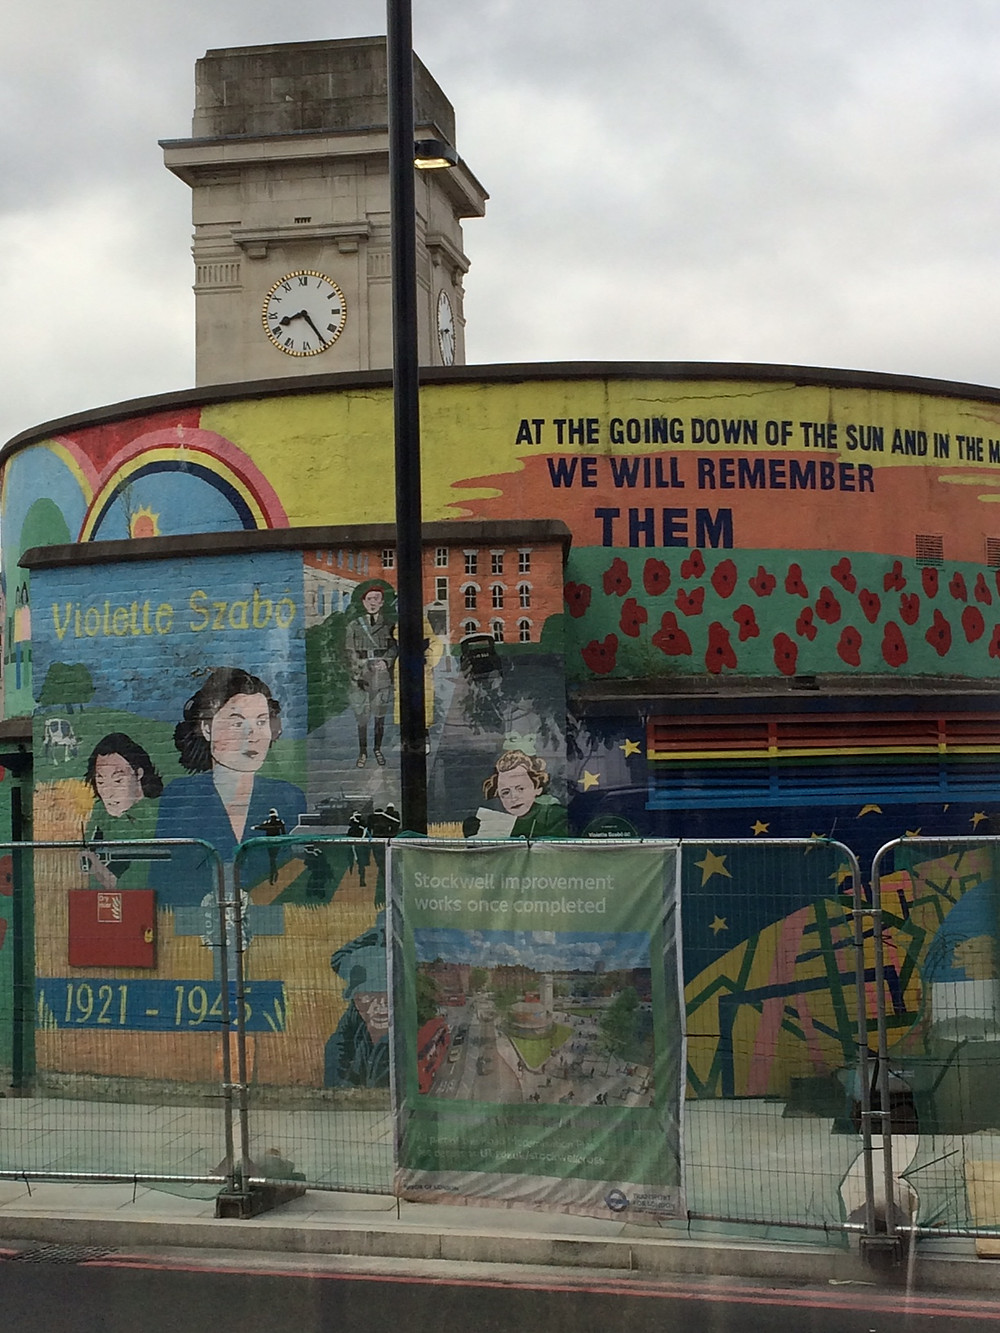 Stockwell world war II memorial and mural